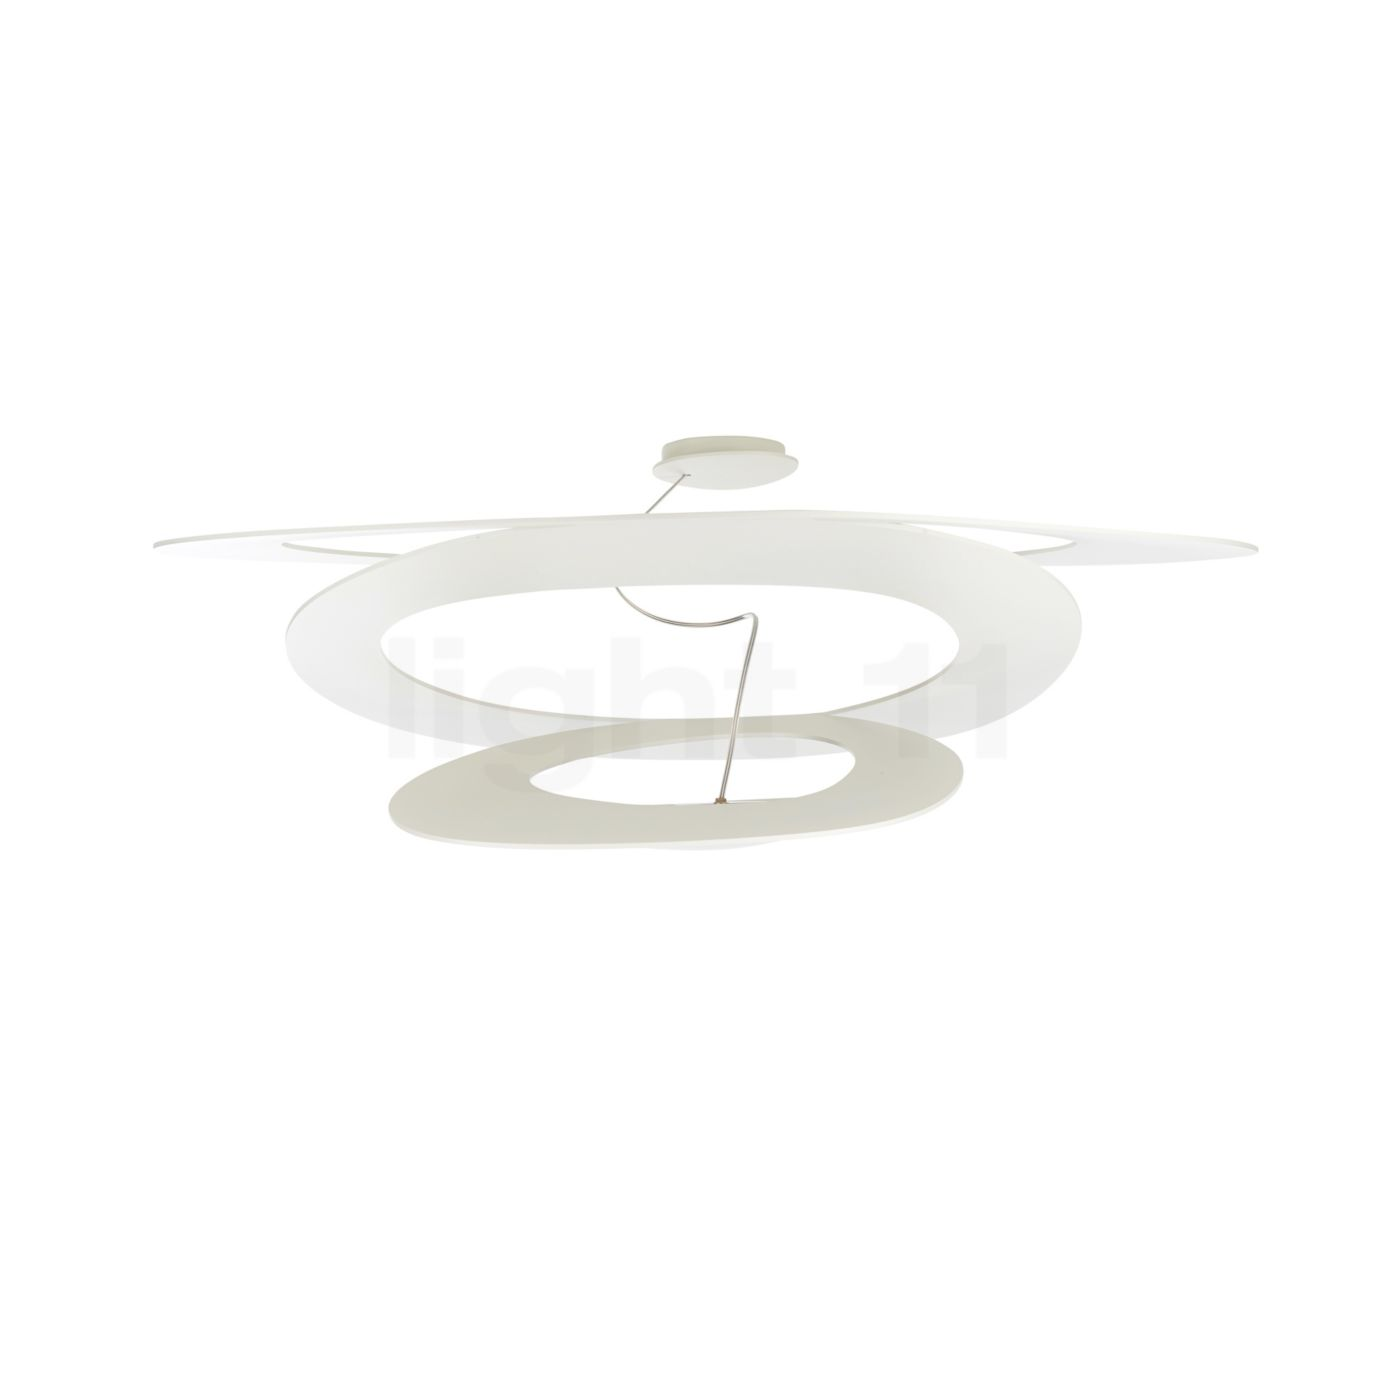 artemide pirce soffitto surfacemounted ceiling lights -